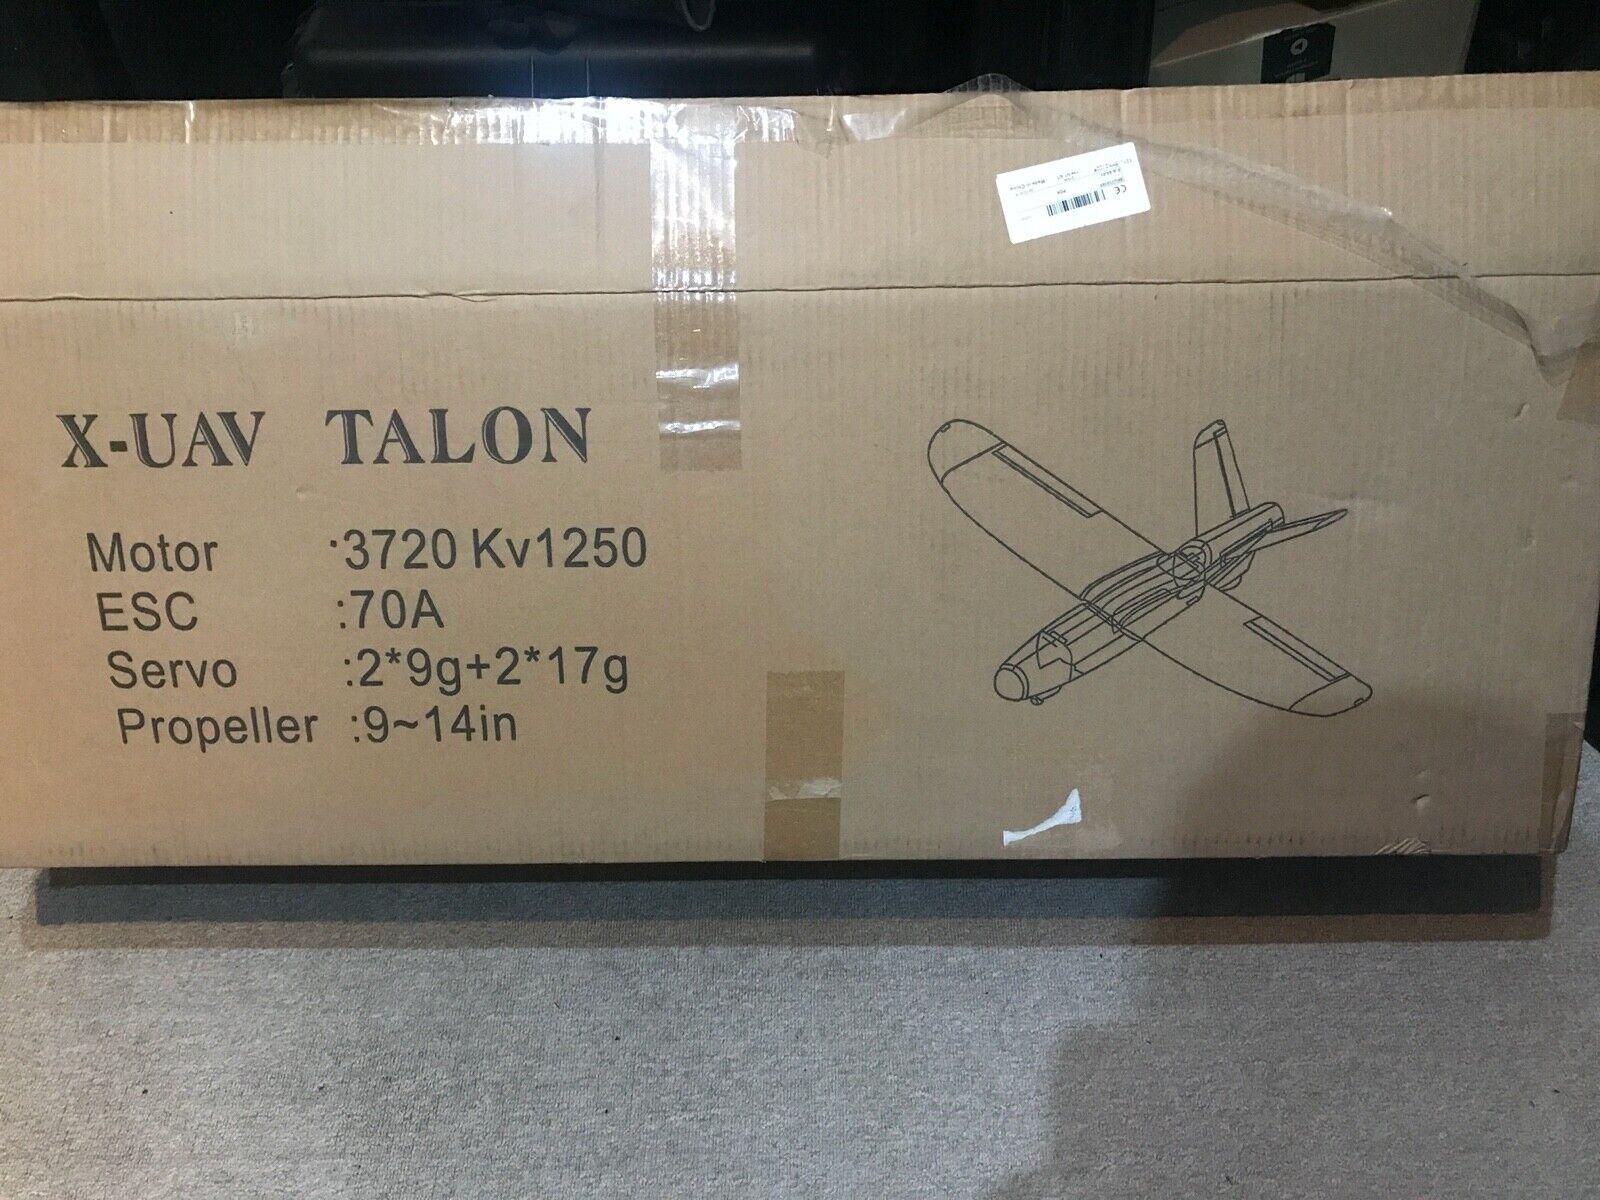 X Uav Clouds 1880mm Wingspan Epo Fpv Aircraft Rc Airplane Kit For Sale Ebay